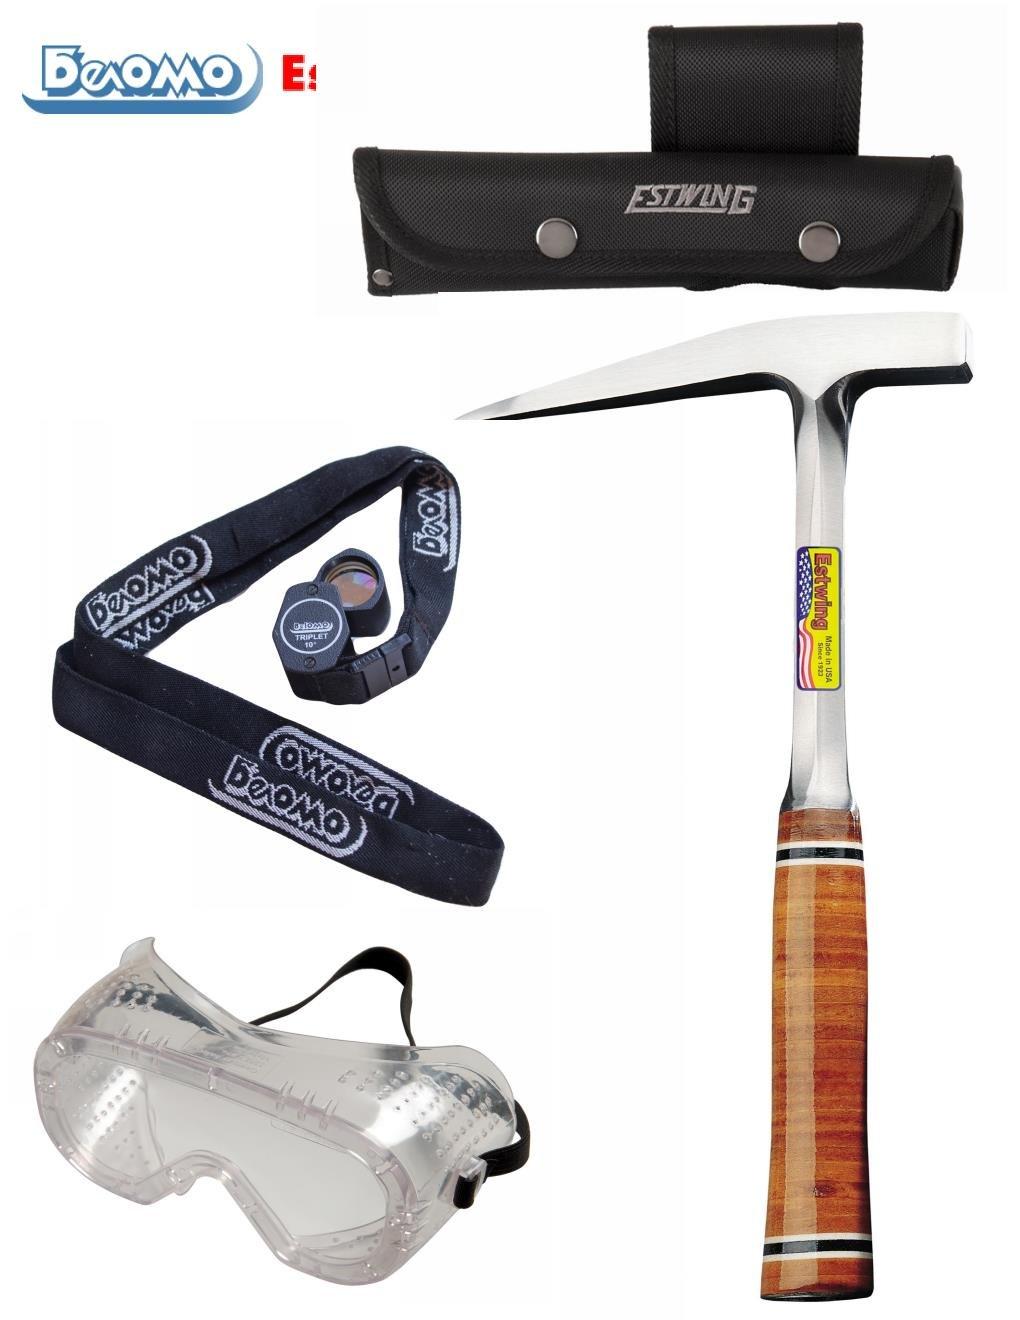 Geologist Field Tools / Rockhound Tool Kit Estwing BelOMO (13 oz Leather Handle)